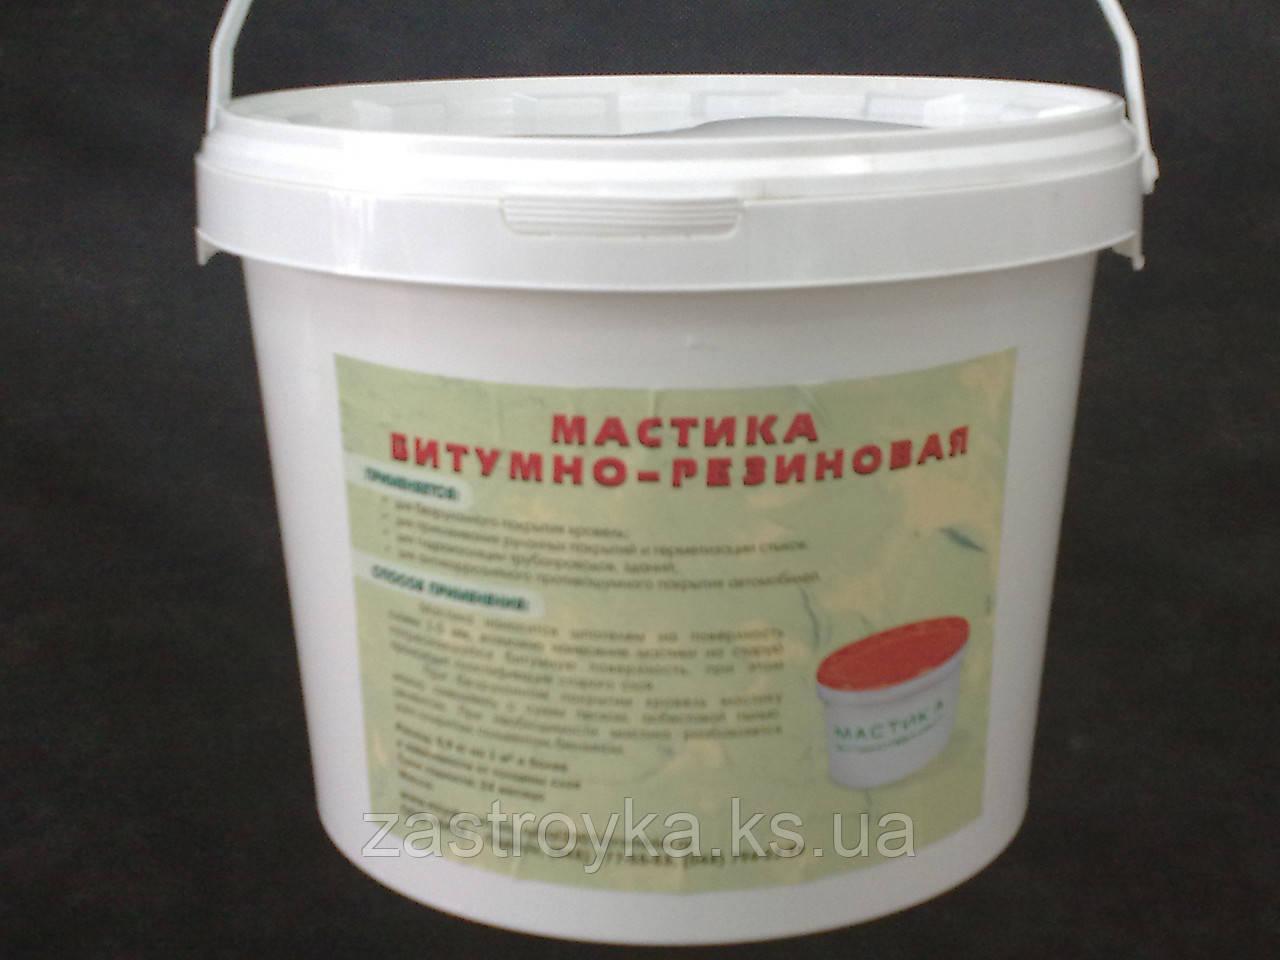 Мастика битумно-резиновая, 25 кг